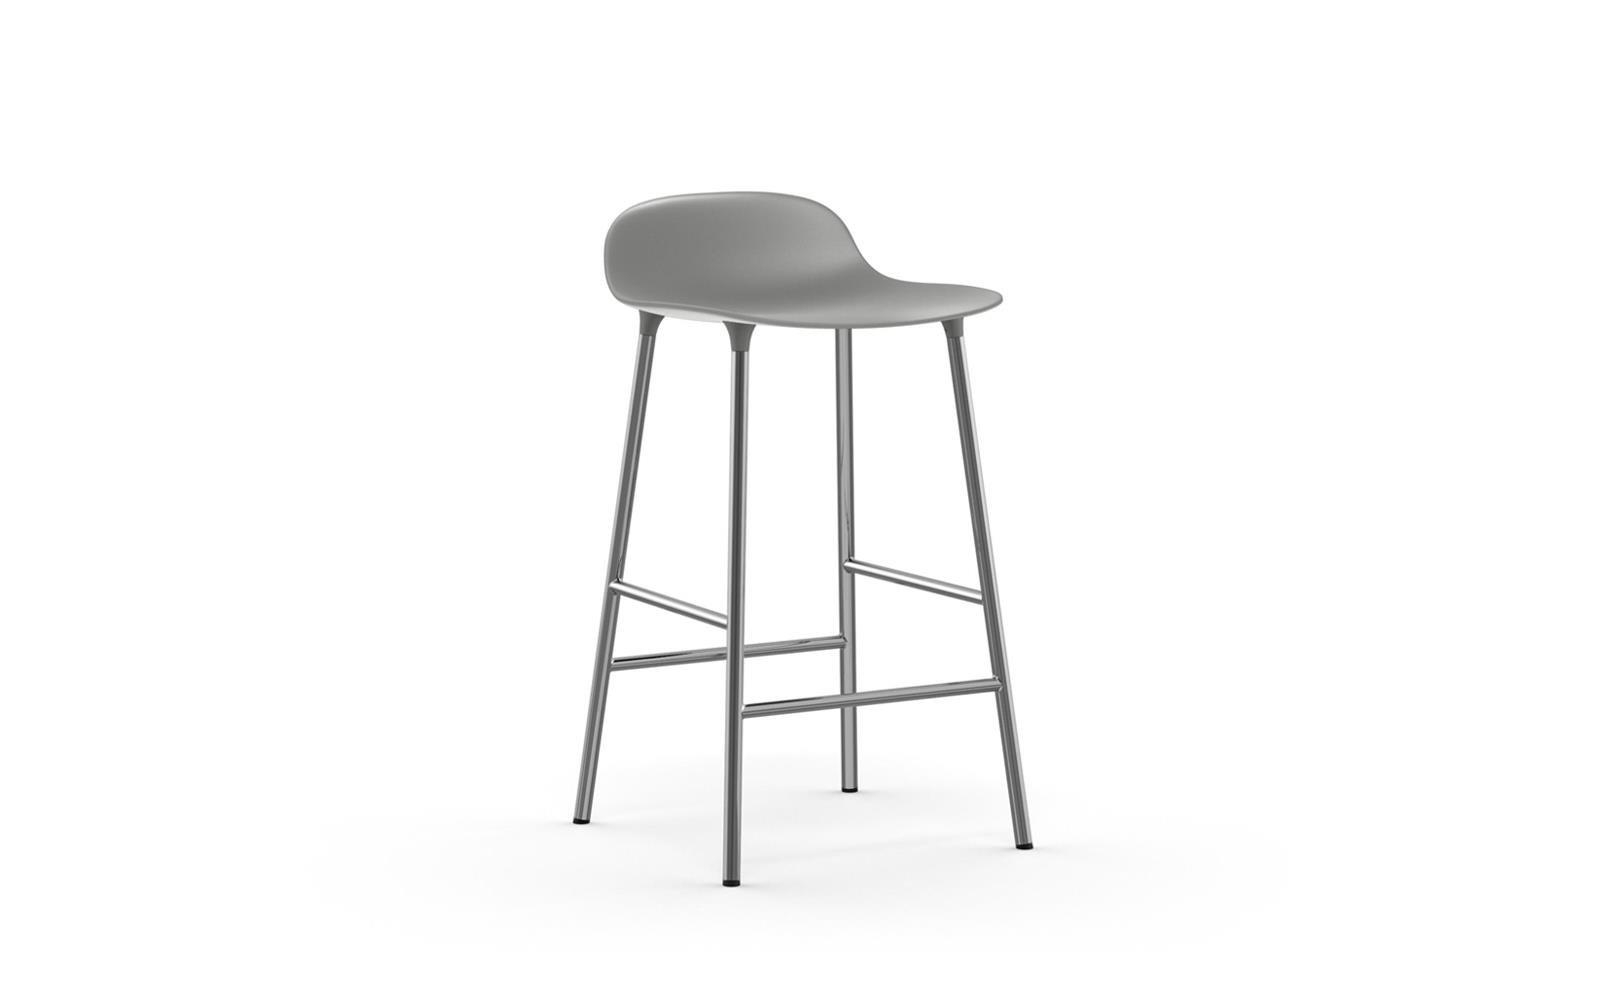 Normann Copenhagen - Form Bar Stool 65 cm - Grey/Chrom Legs (603157)